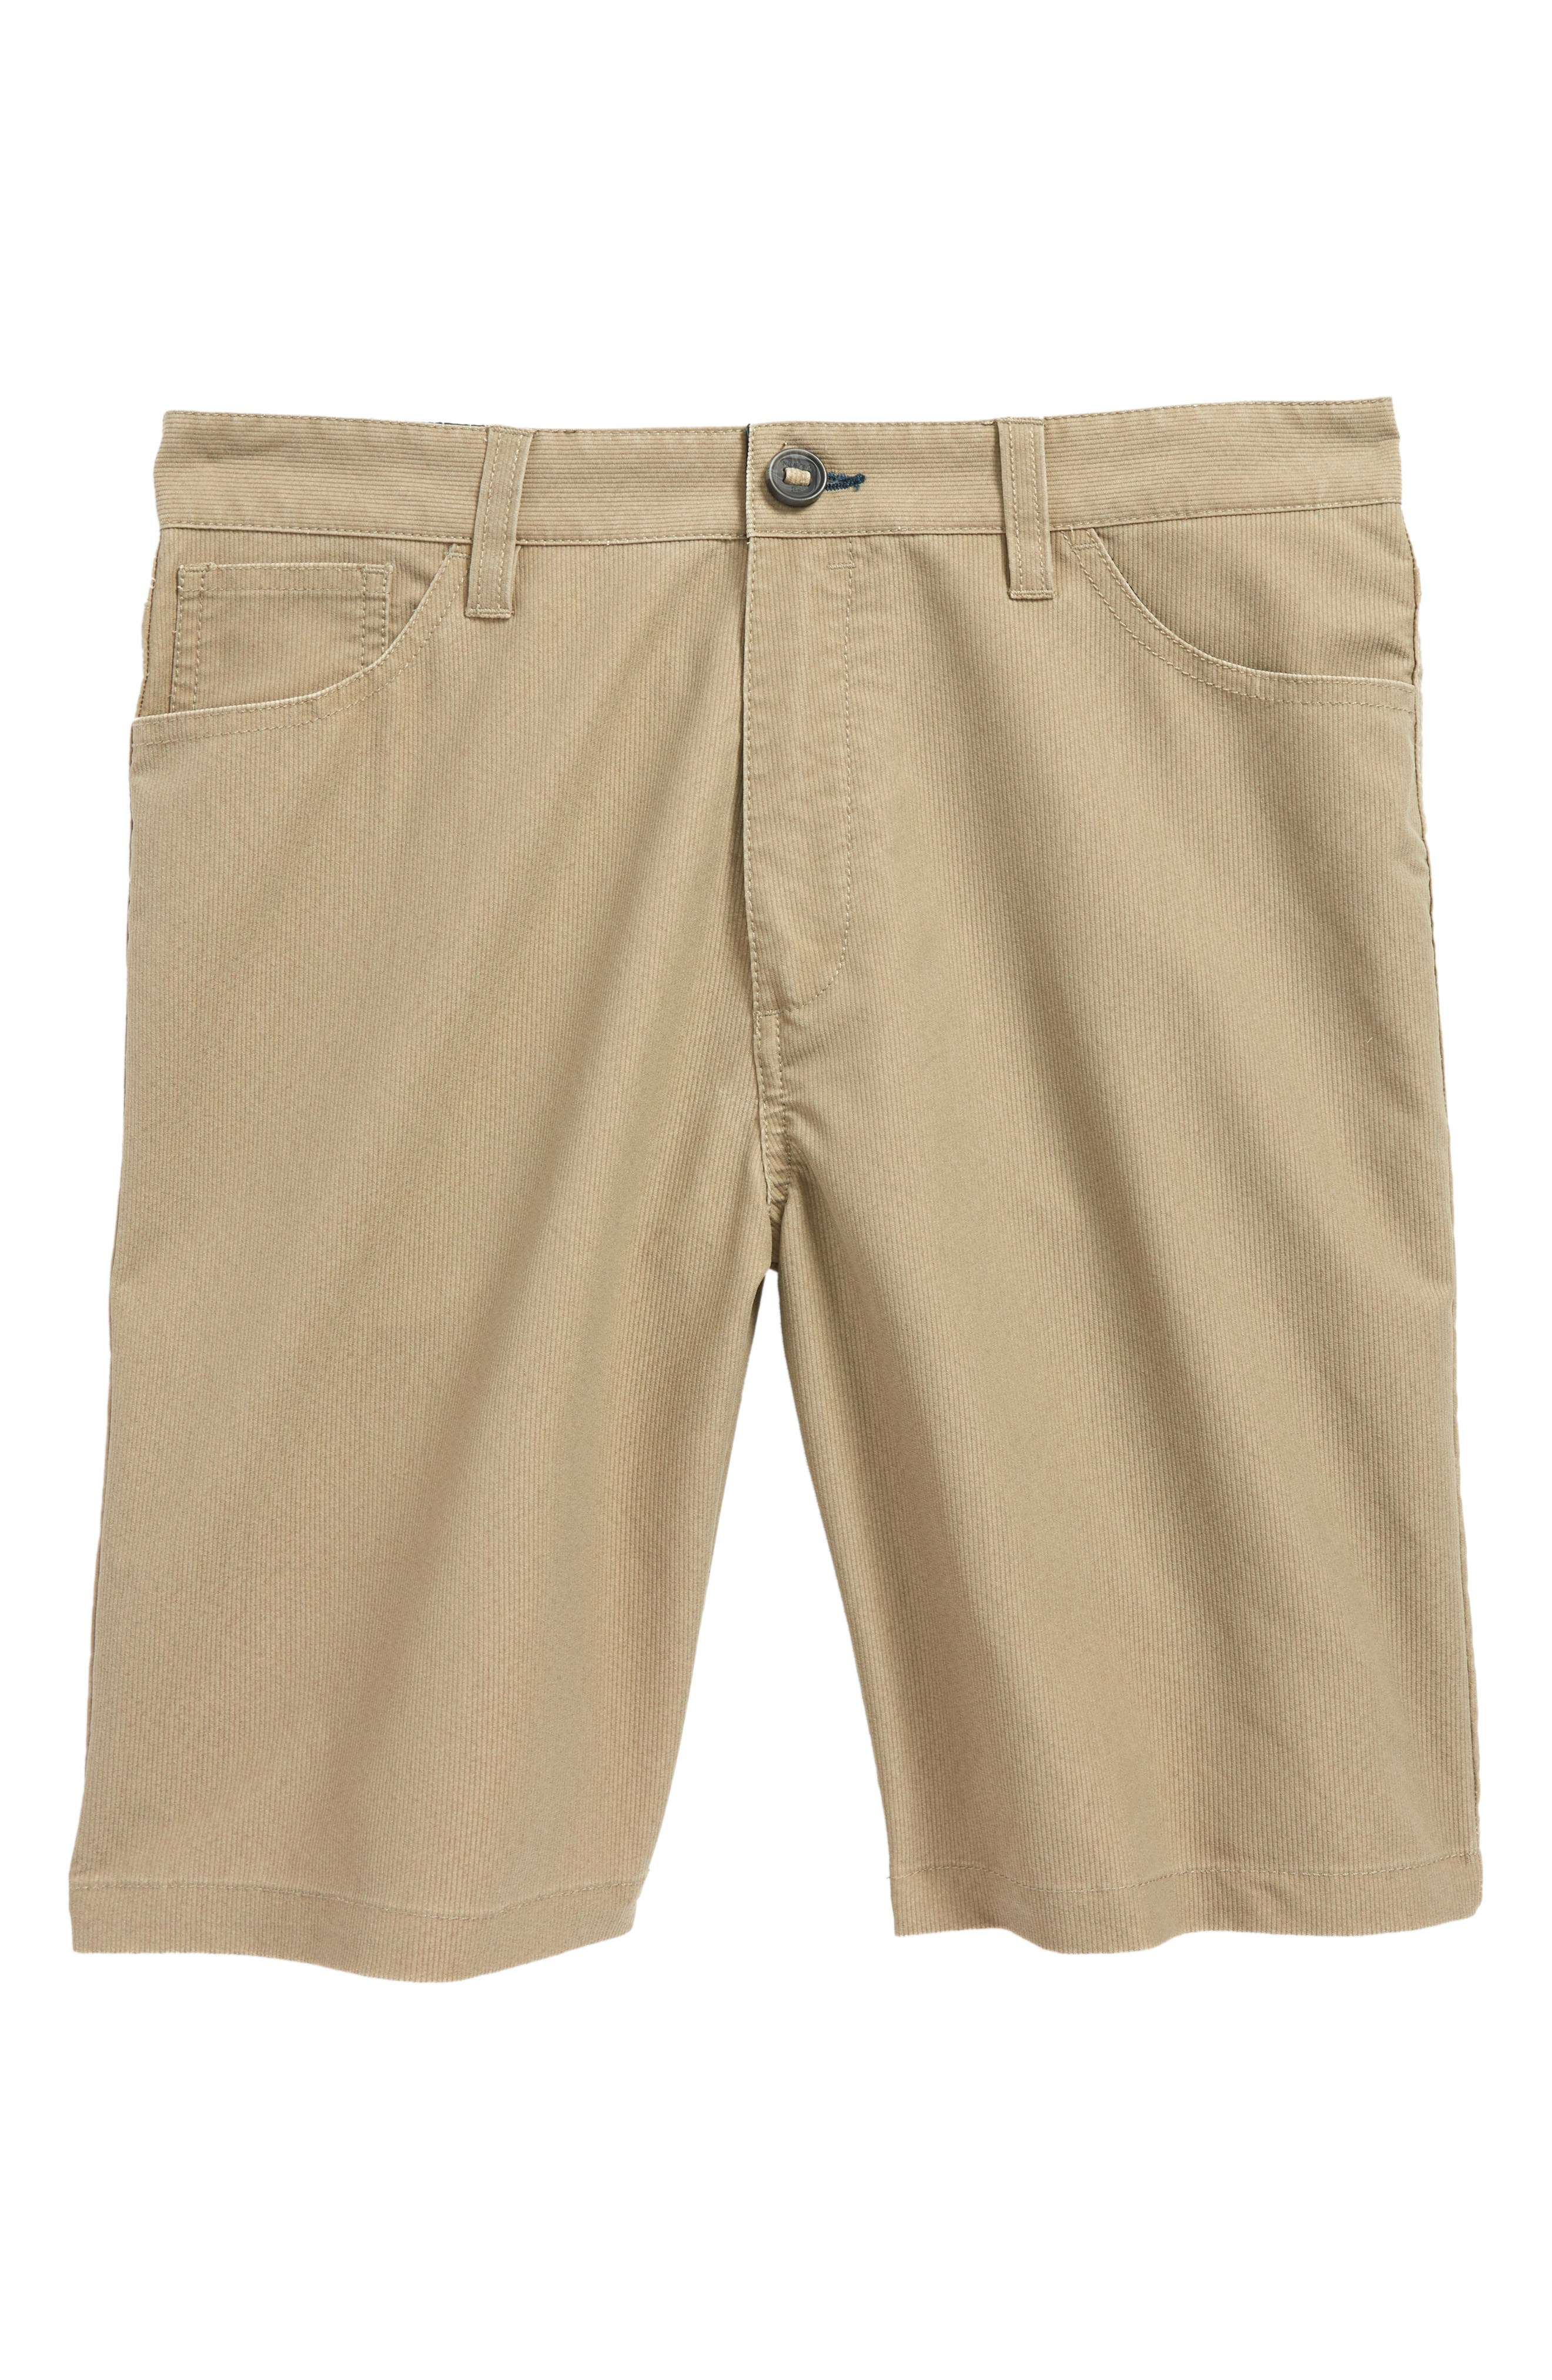 Outsider X Surf Corduroy Hybrid Shorts,                         Main,                         color, Khaki